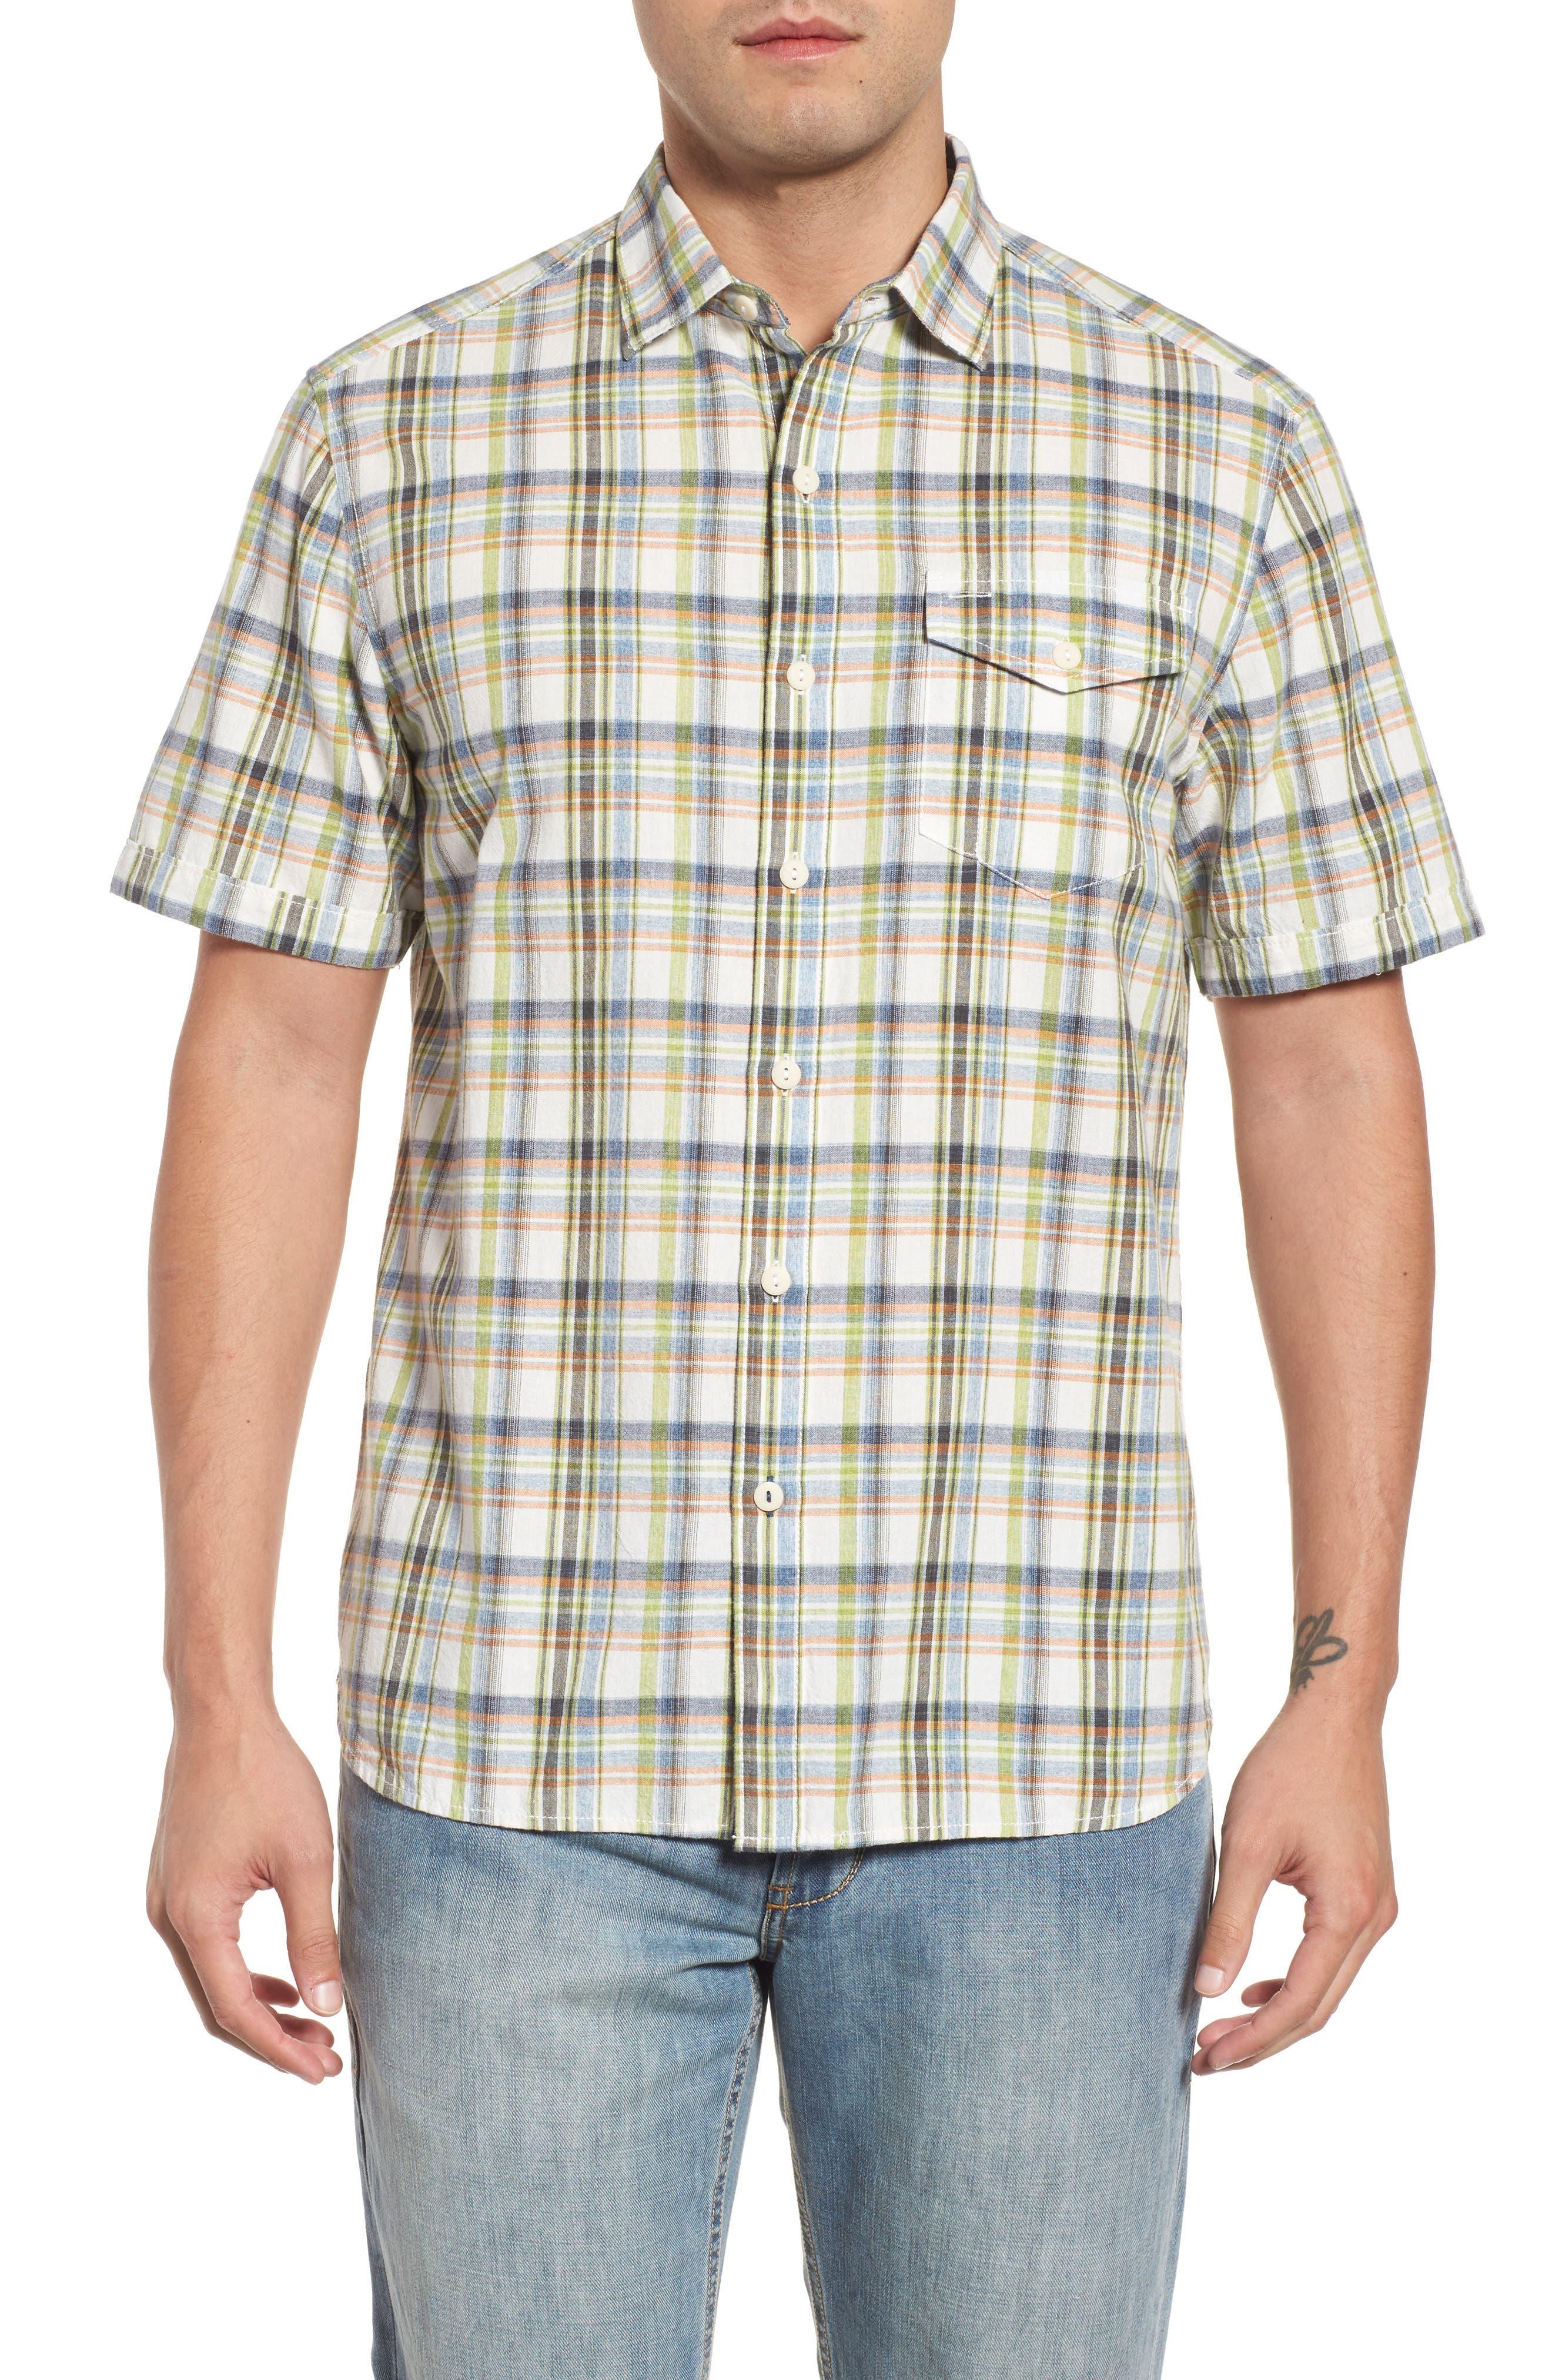 Ocean Cay Plaid Sport Shirt,                         Main,                         color, Tart Apple